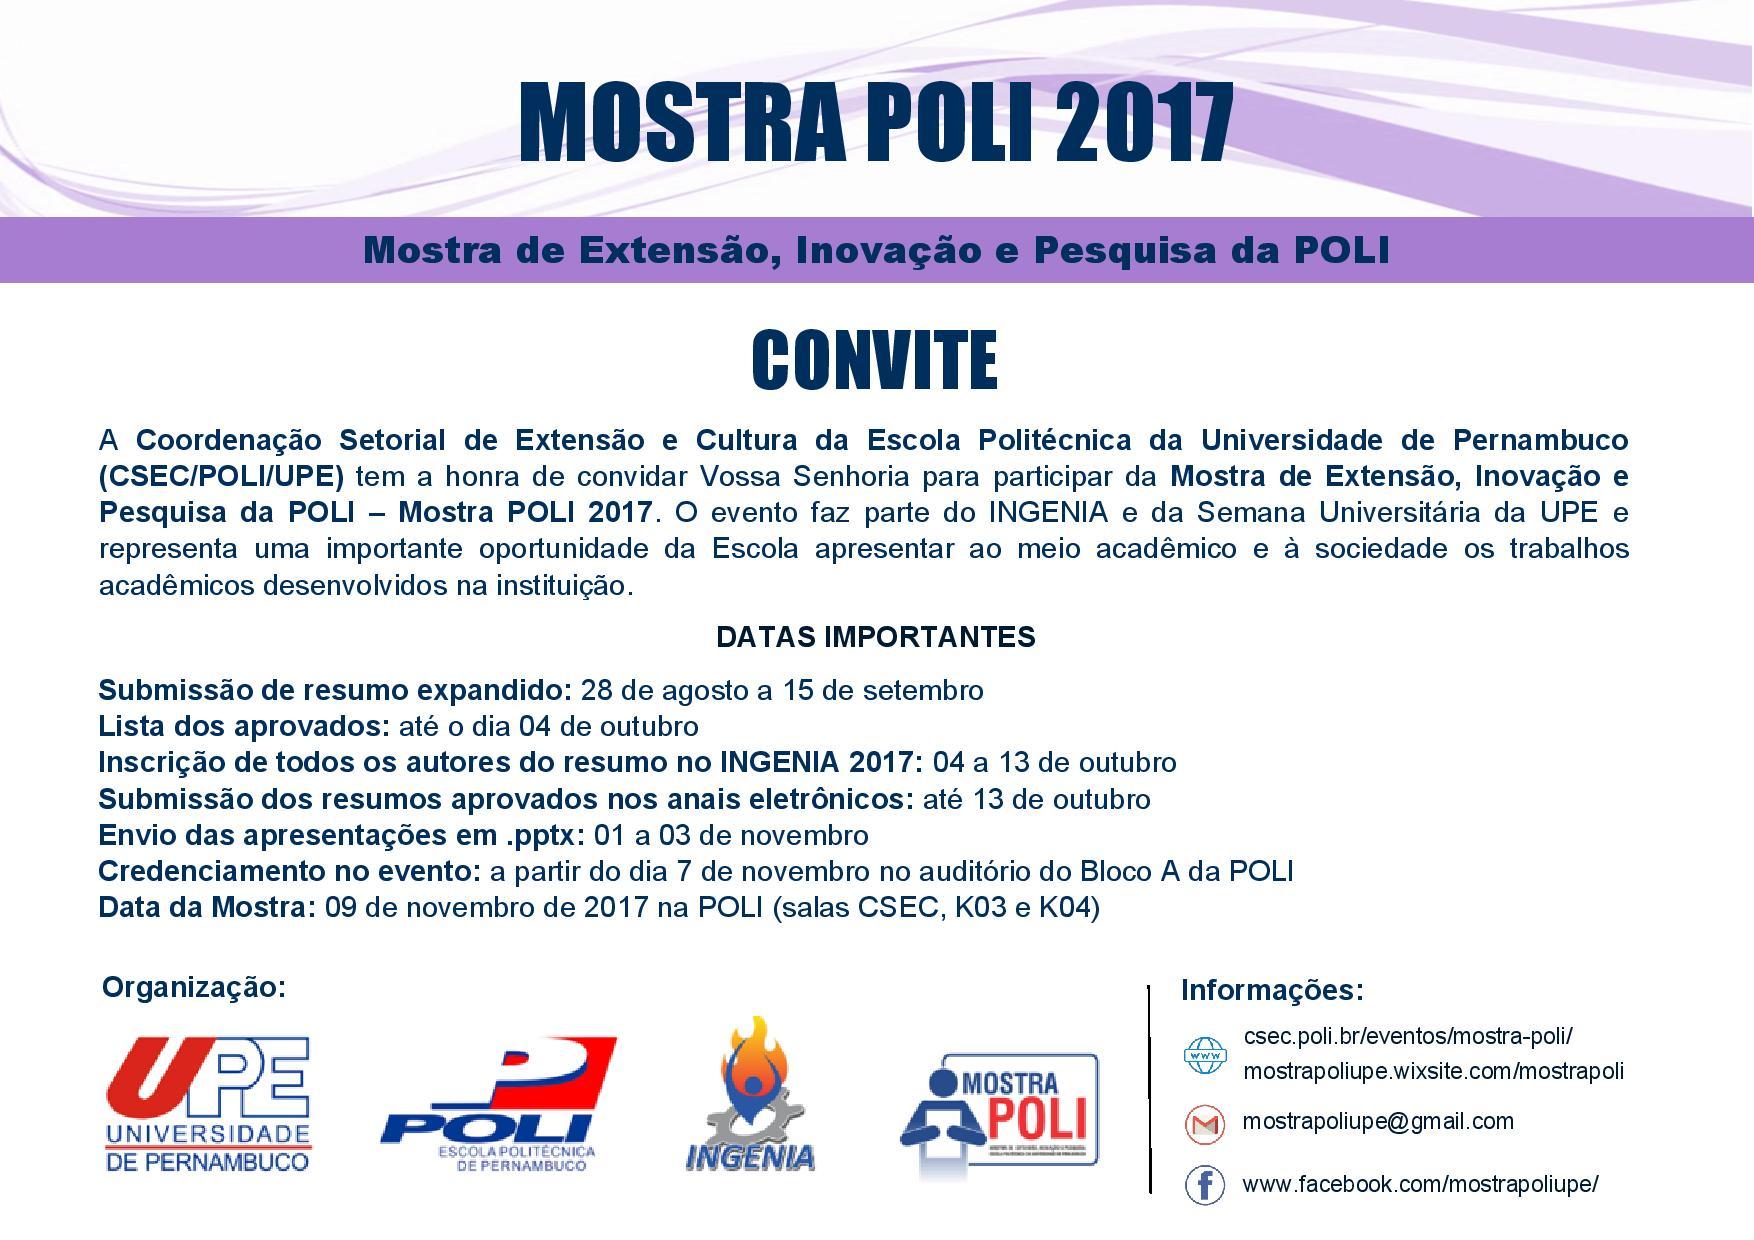 Convite_Mostra-Poli_Datas Importantes img